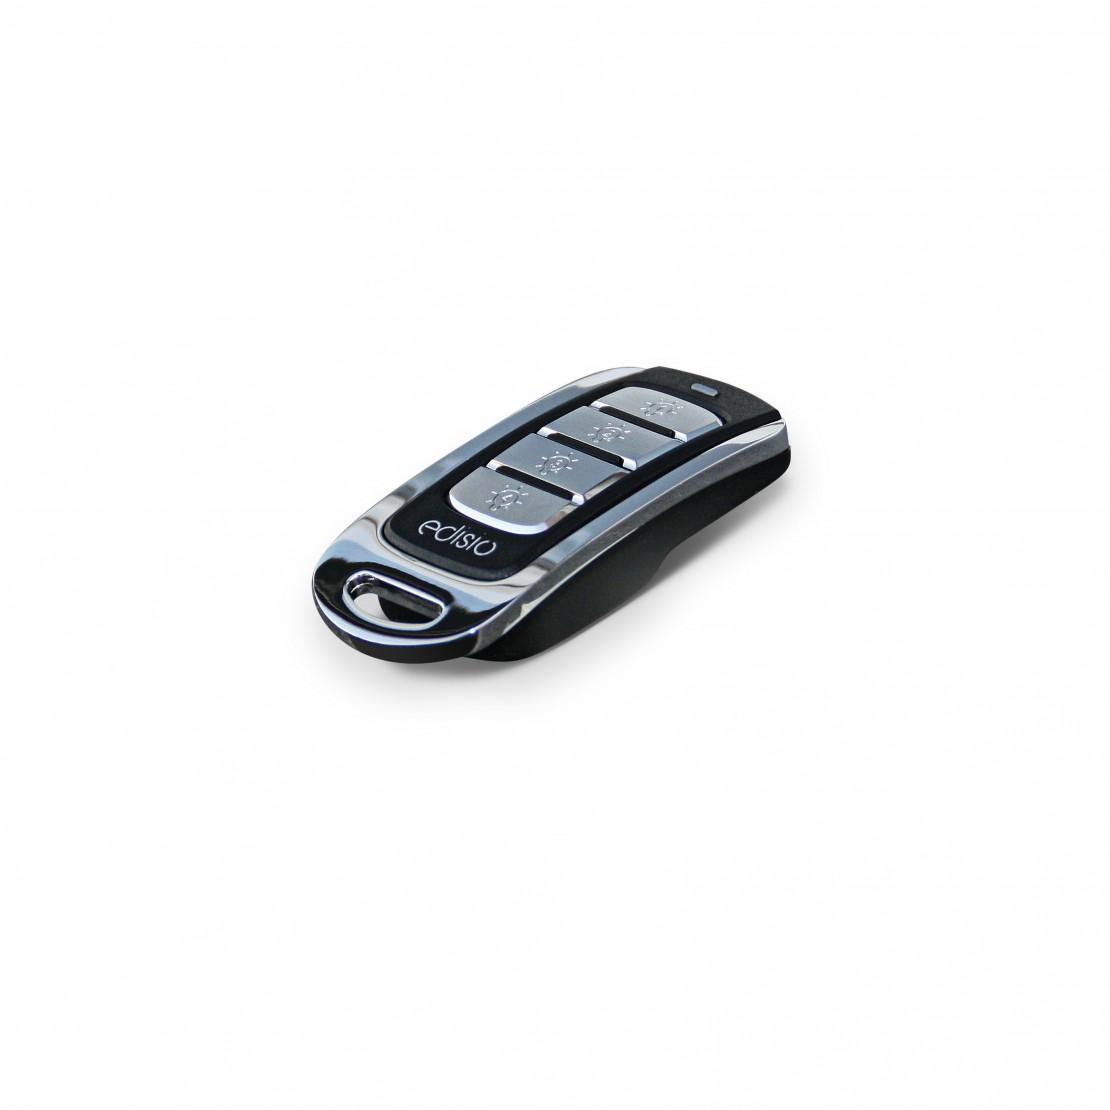 4-channel remote control - 868 MHz